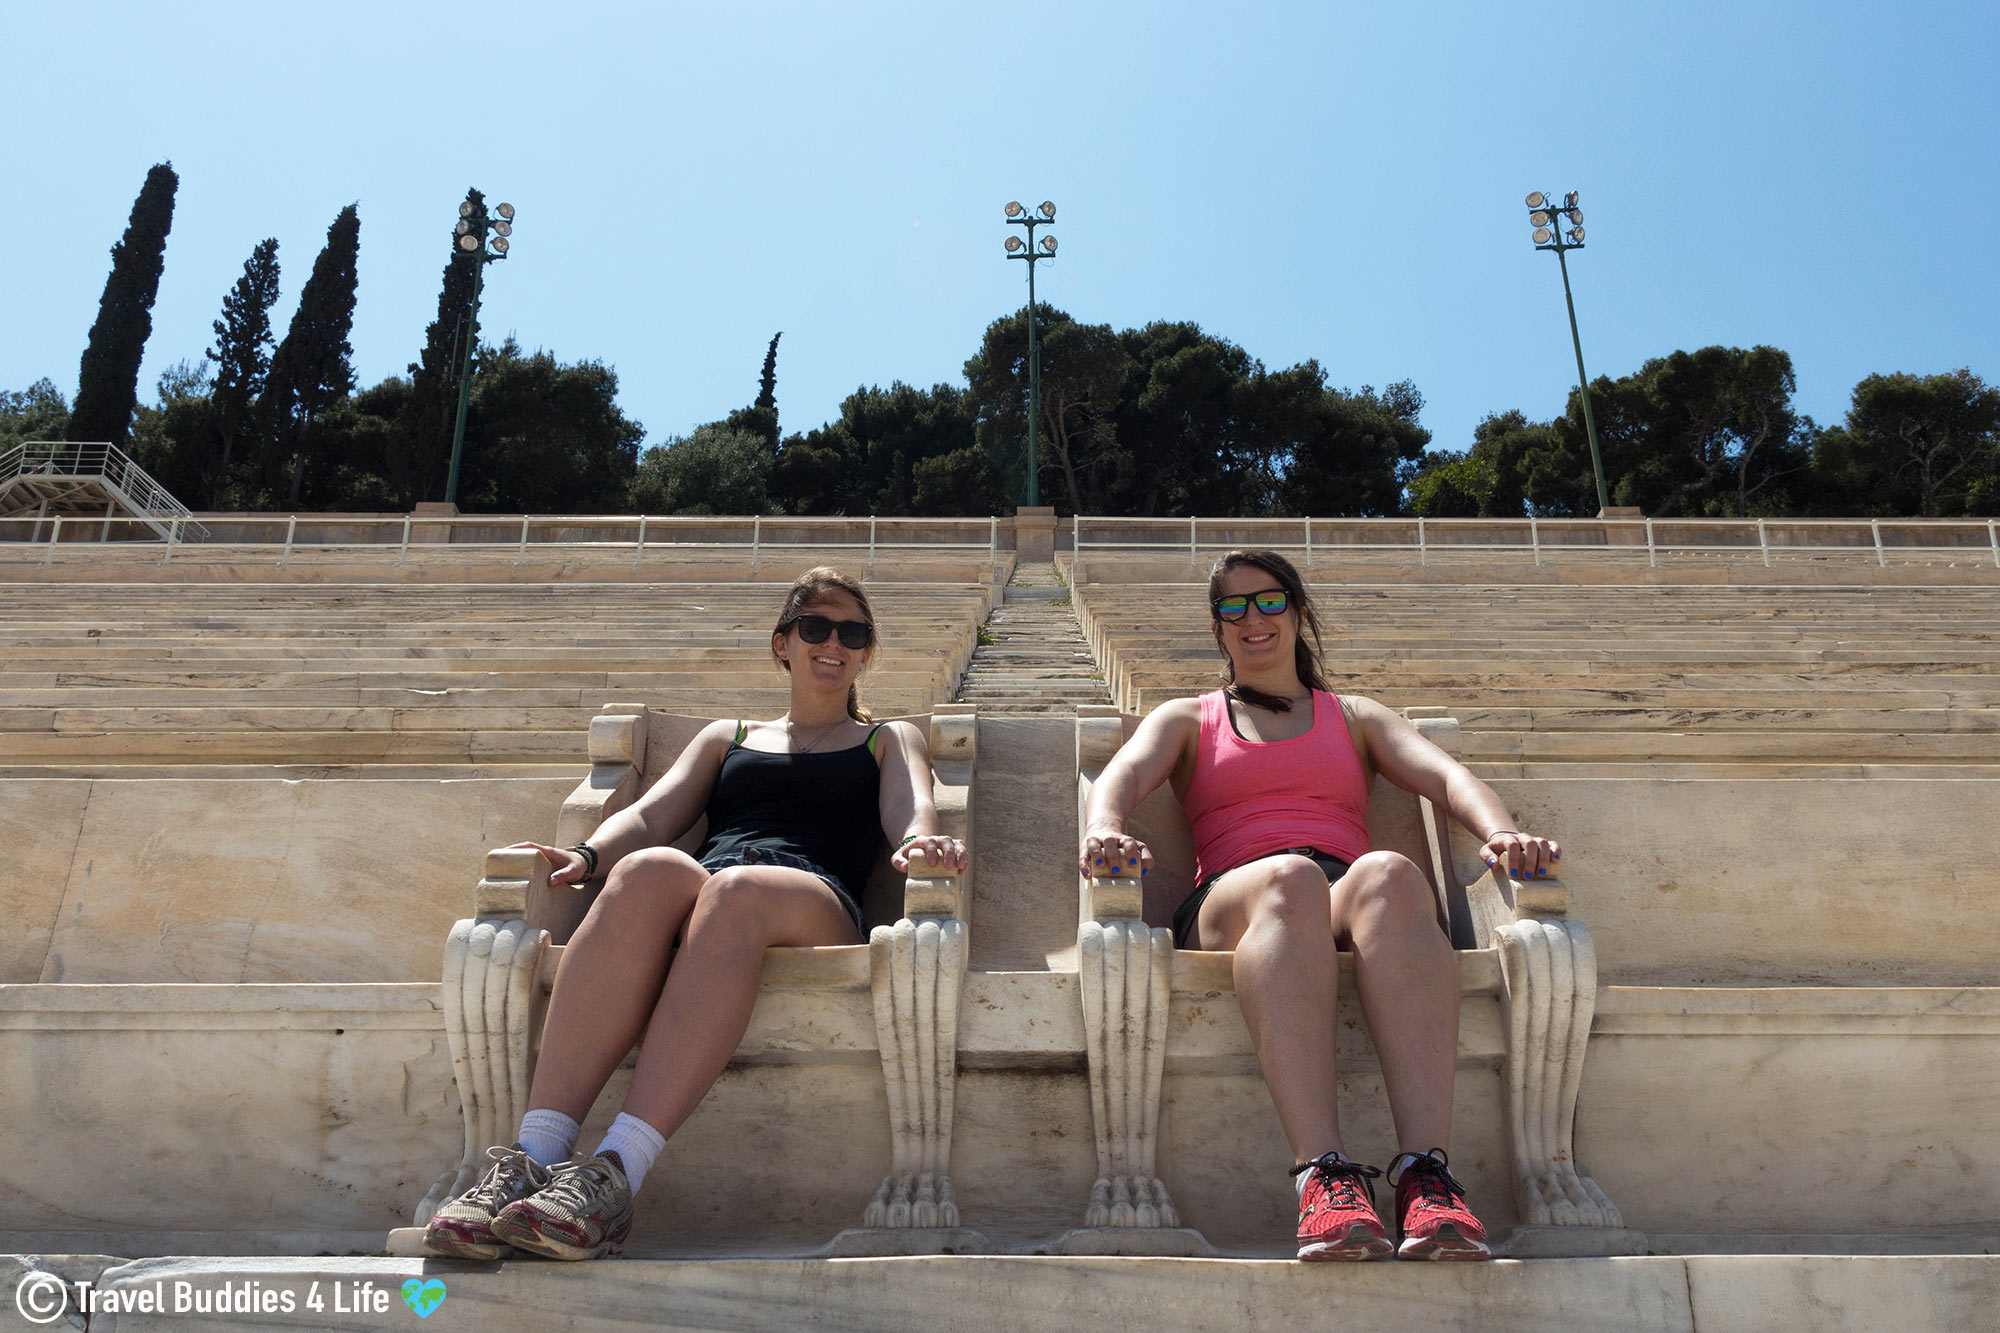 Two Female Traveler's Sitting In Important Seats At The Athens Panathenaic Stadium In Greece, European Travel